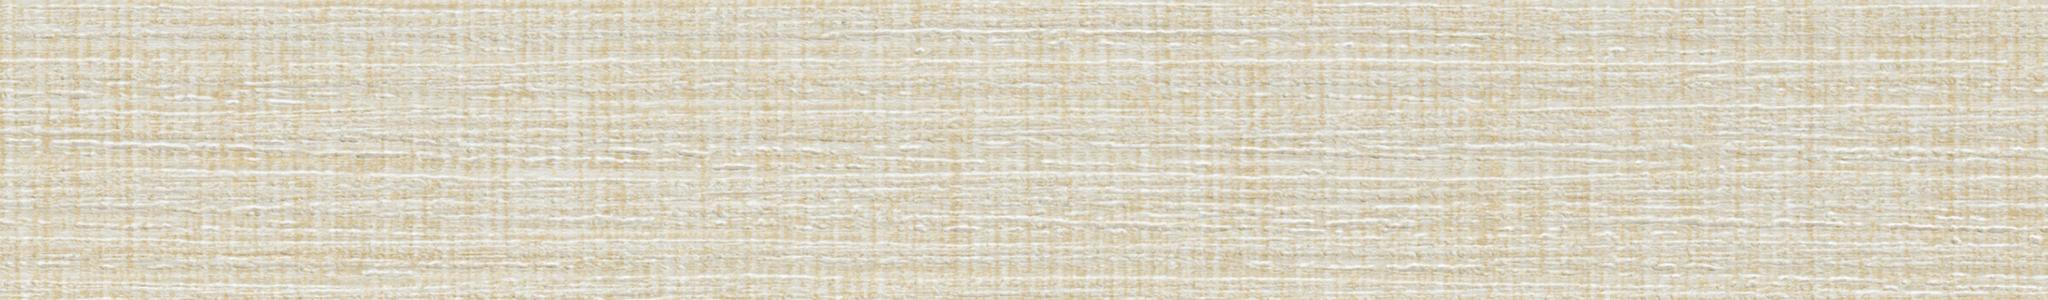 HD 29727 кромка ABS Beige Textile гравировка